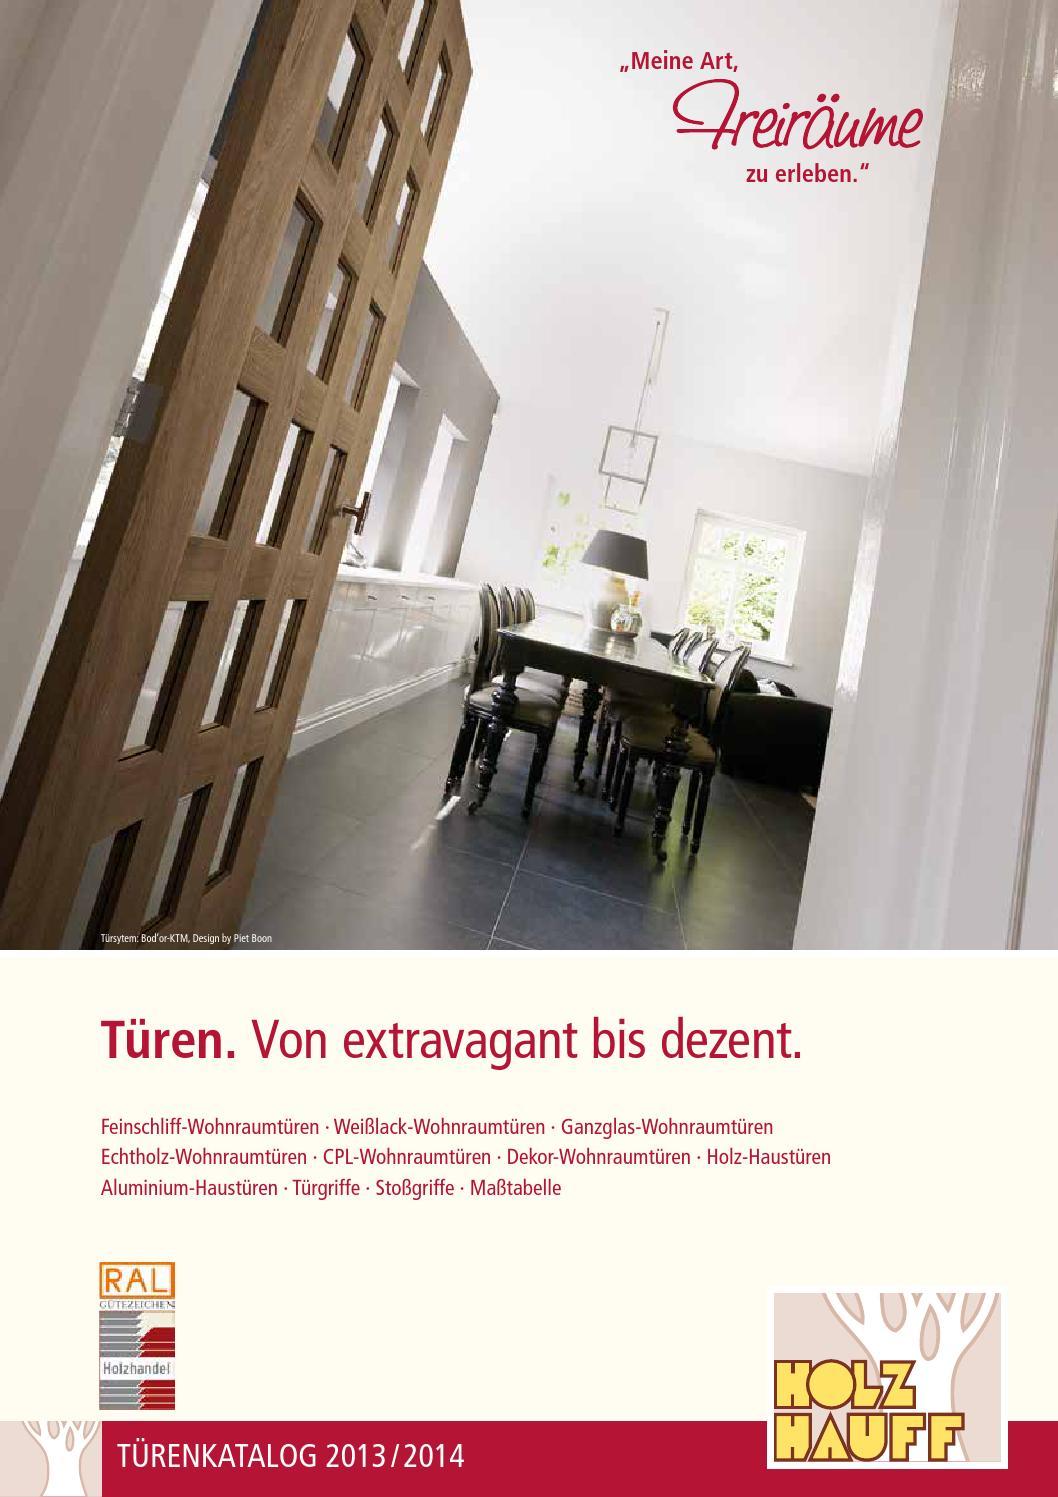 t renkatalog 2013 by opus marketing gmbh issuu. Black Bedroom Furniture Sets. Home Design Ideas